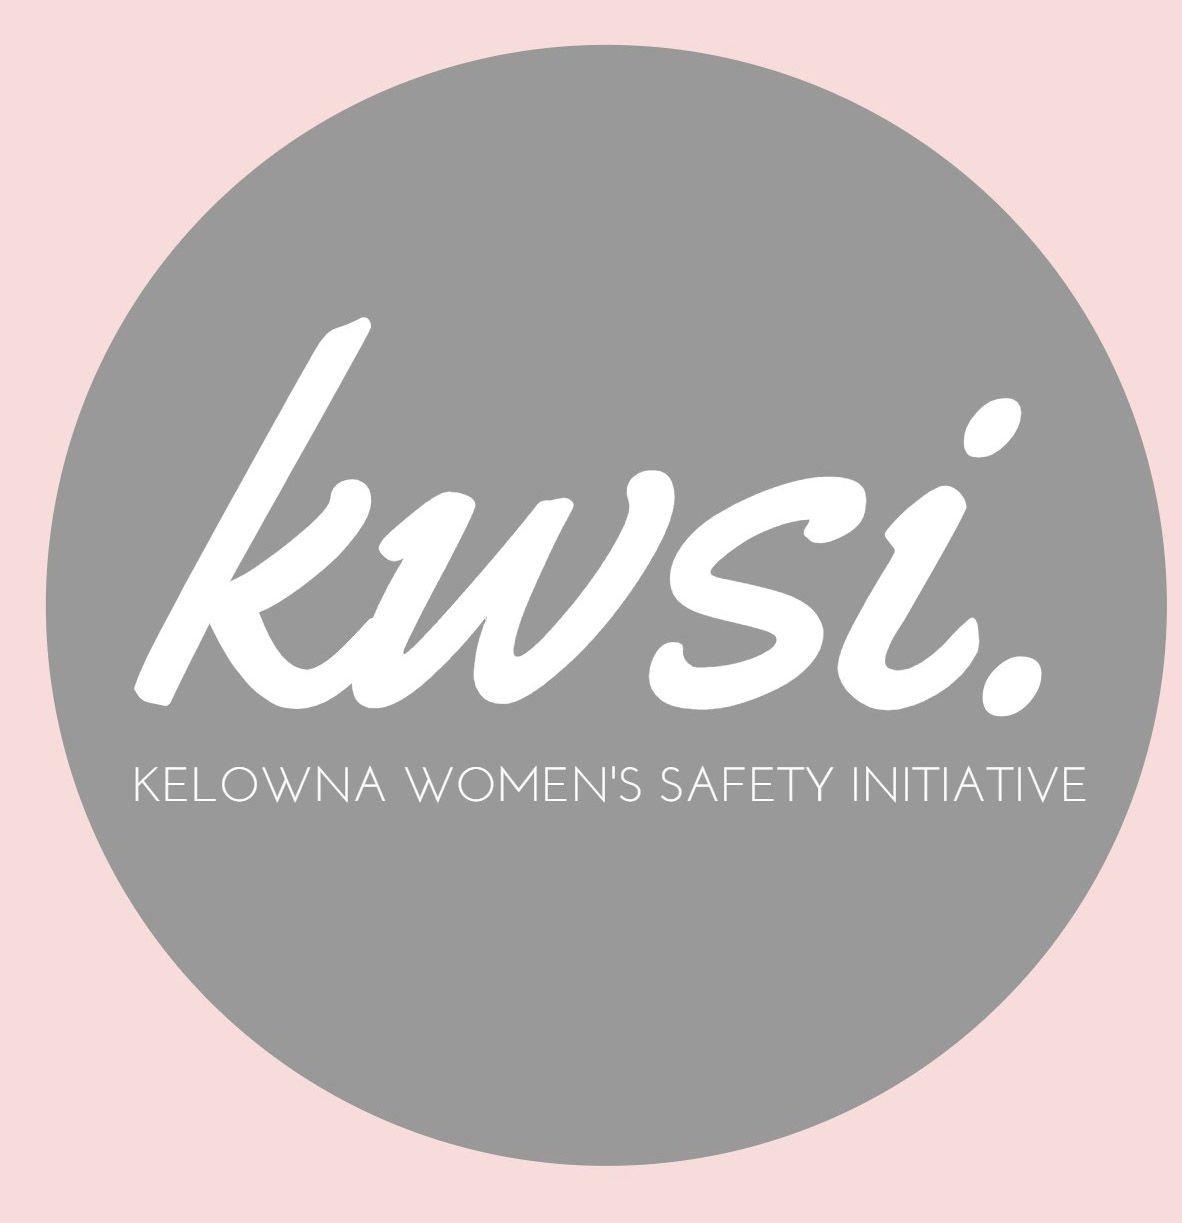 Kelowna Women's Safety Initiative